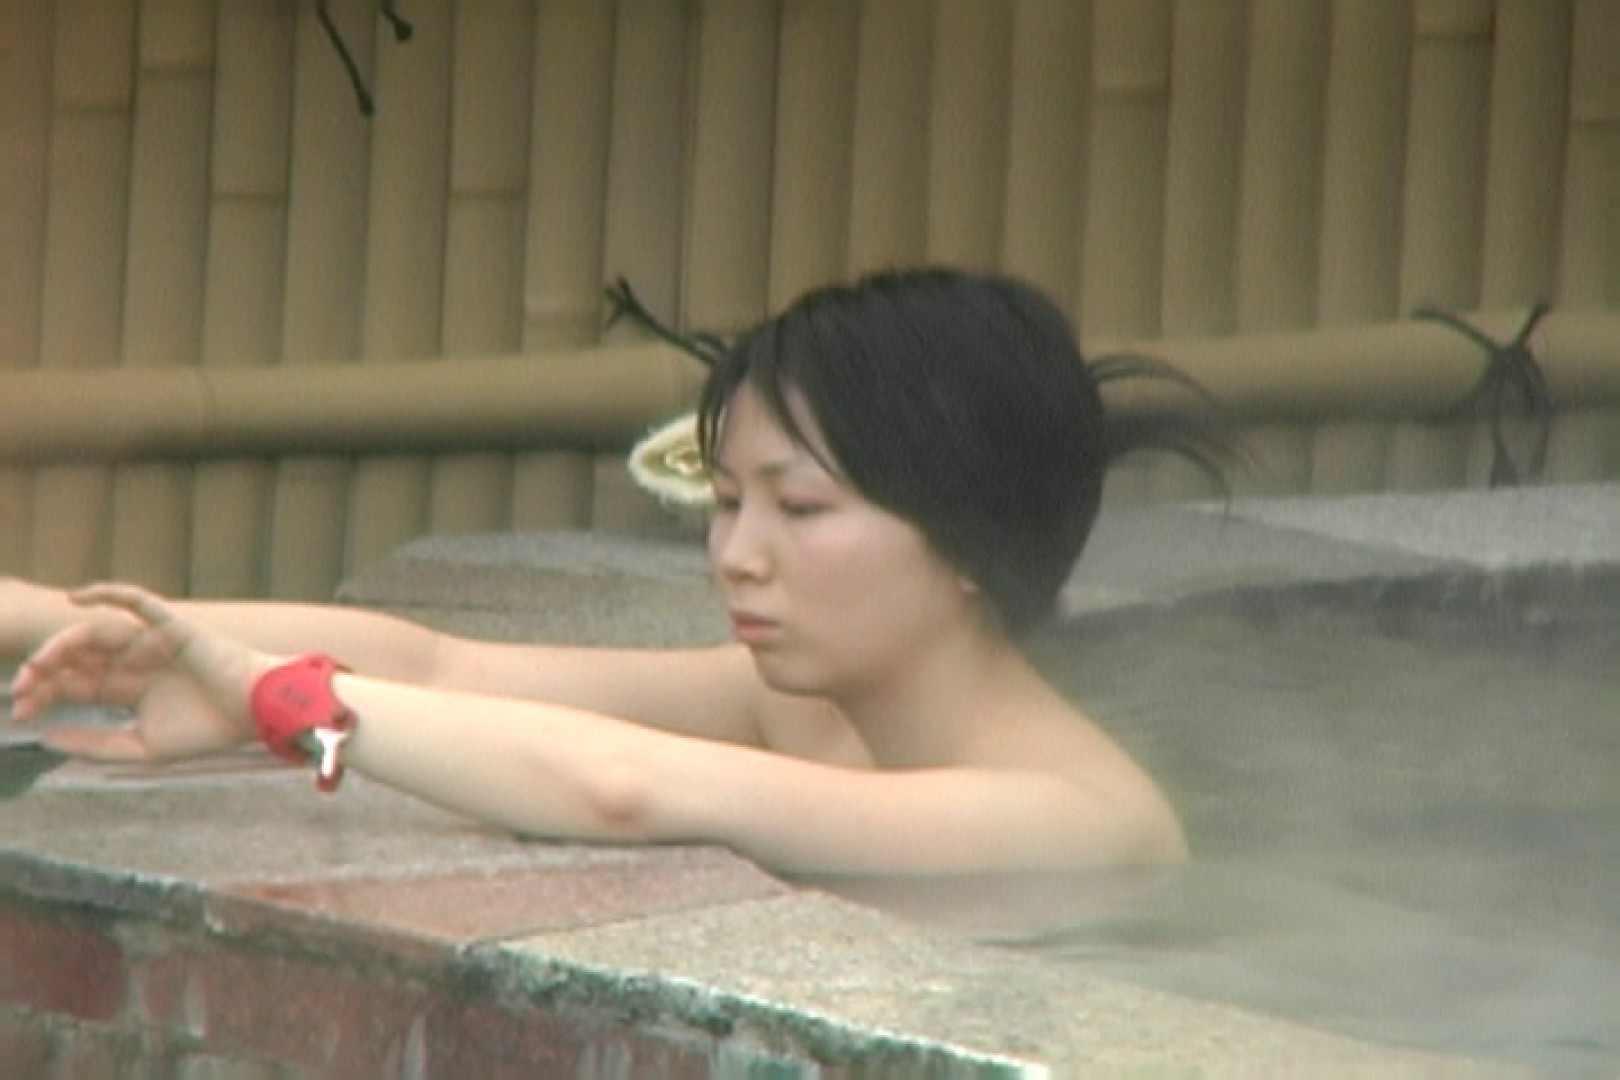 Aquaな露天風呂Vol.567 0 | 0  105連発 81